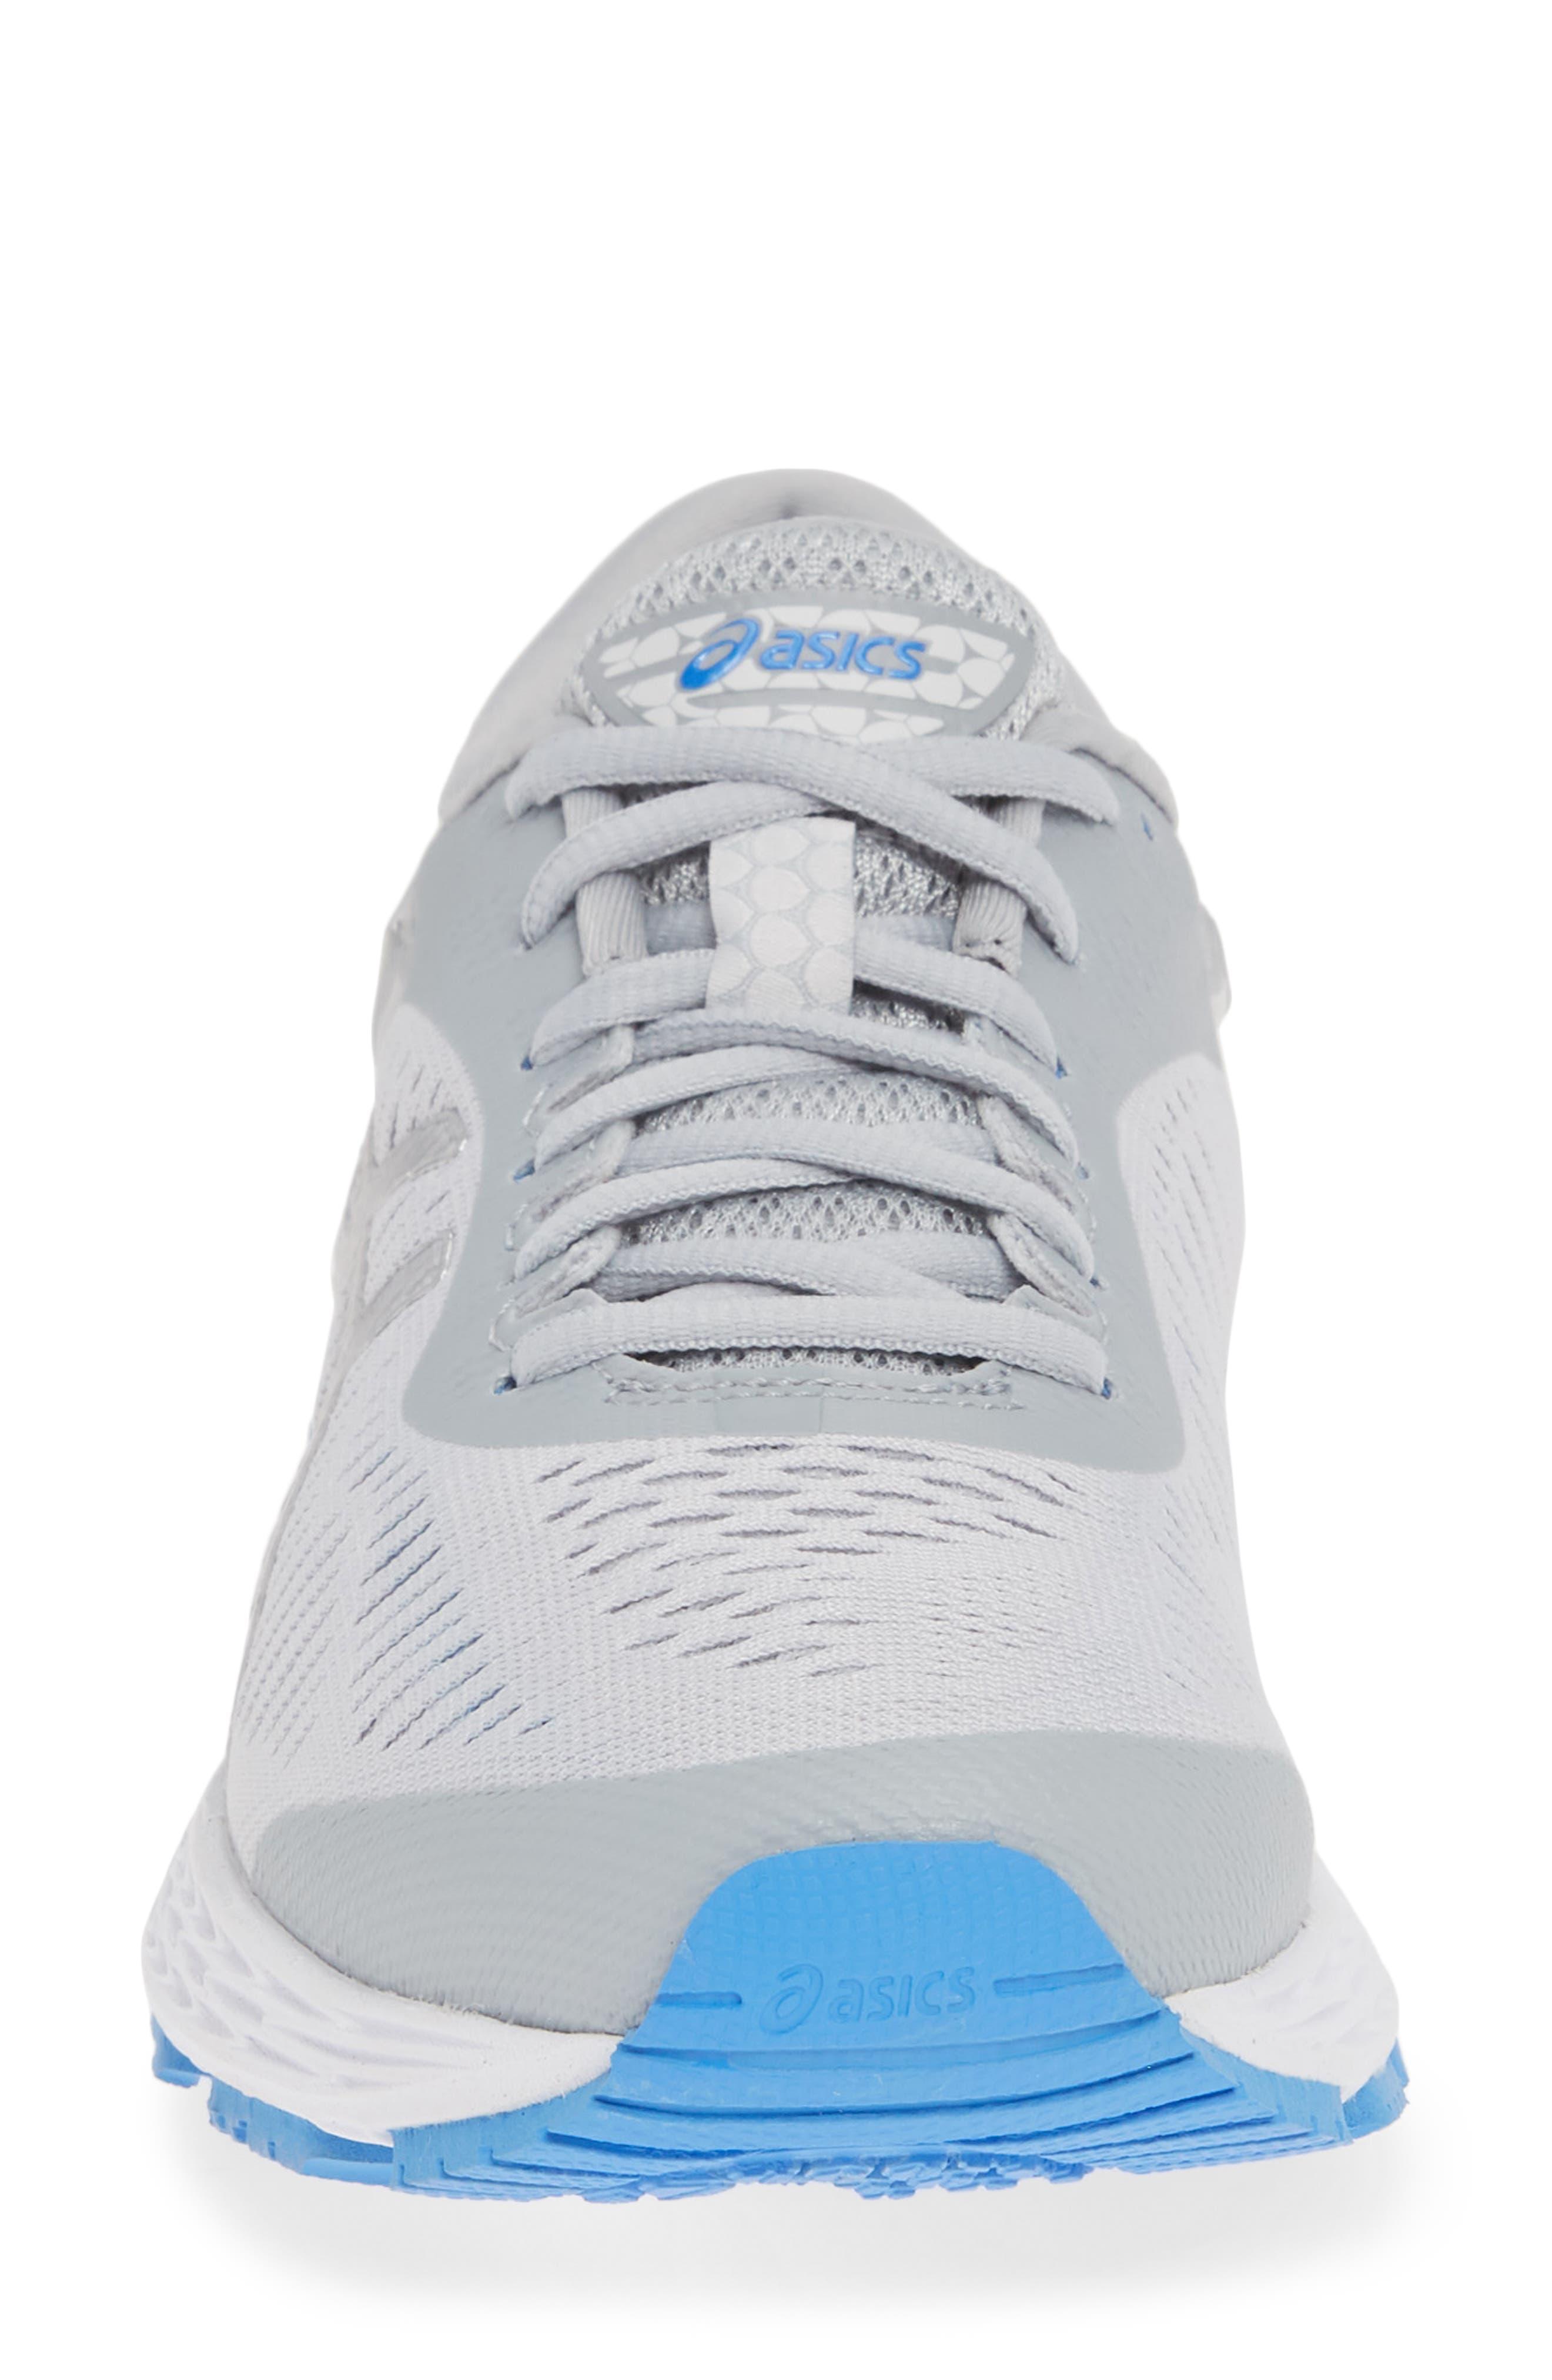 GEL-Kayano<sup>®</sup> 25 Running Shoe,                             Alternate thumbnail 4, color,                             MID GREY/ BLUE